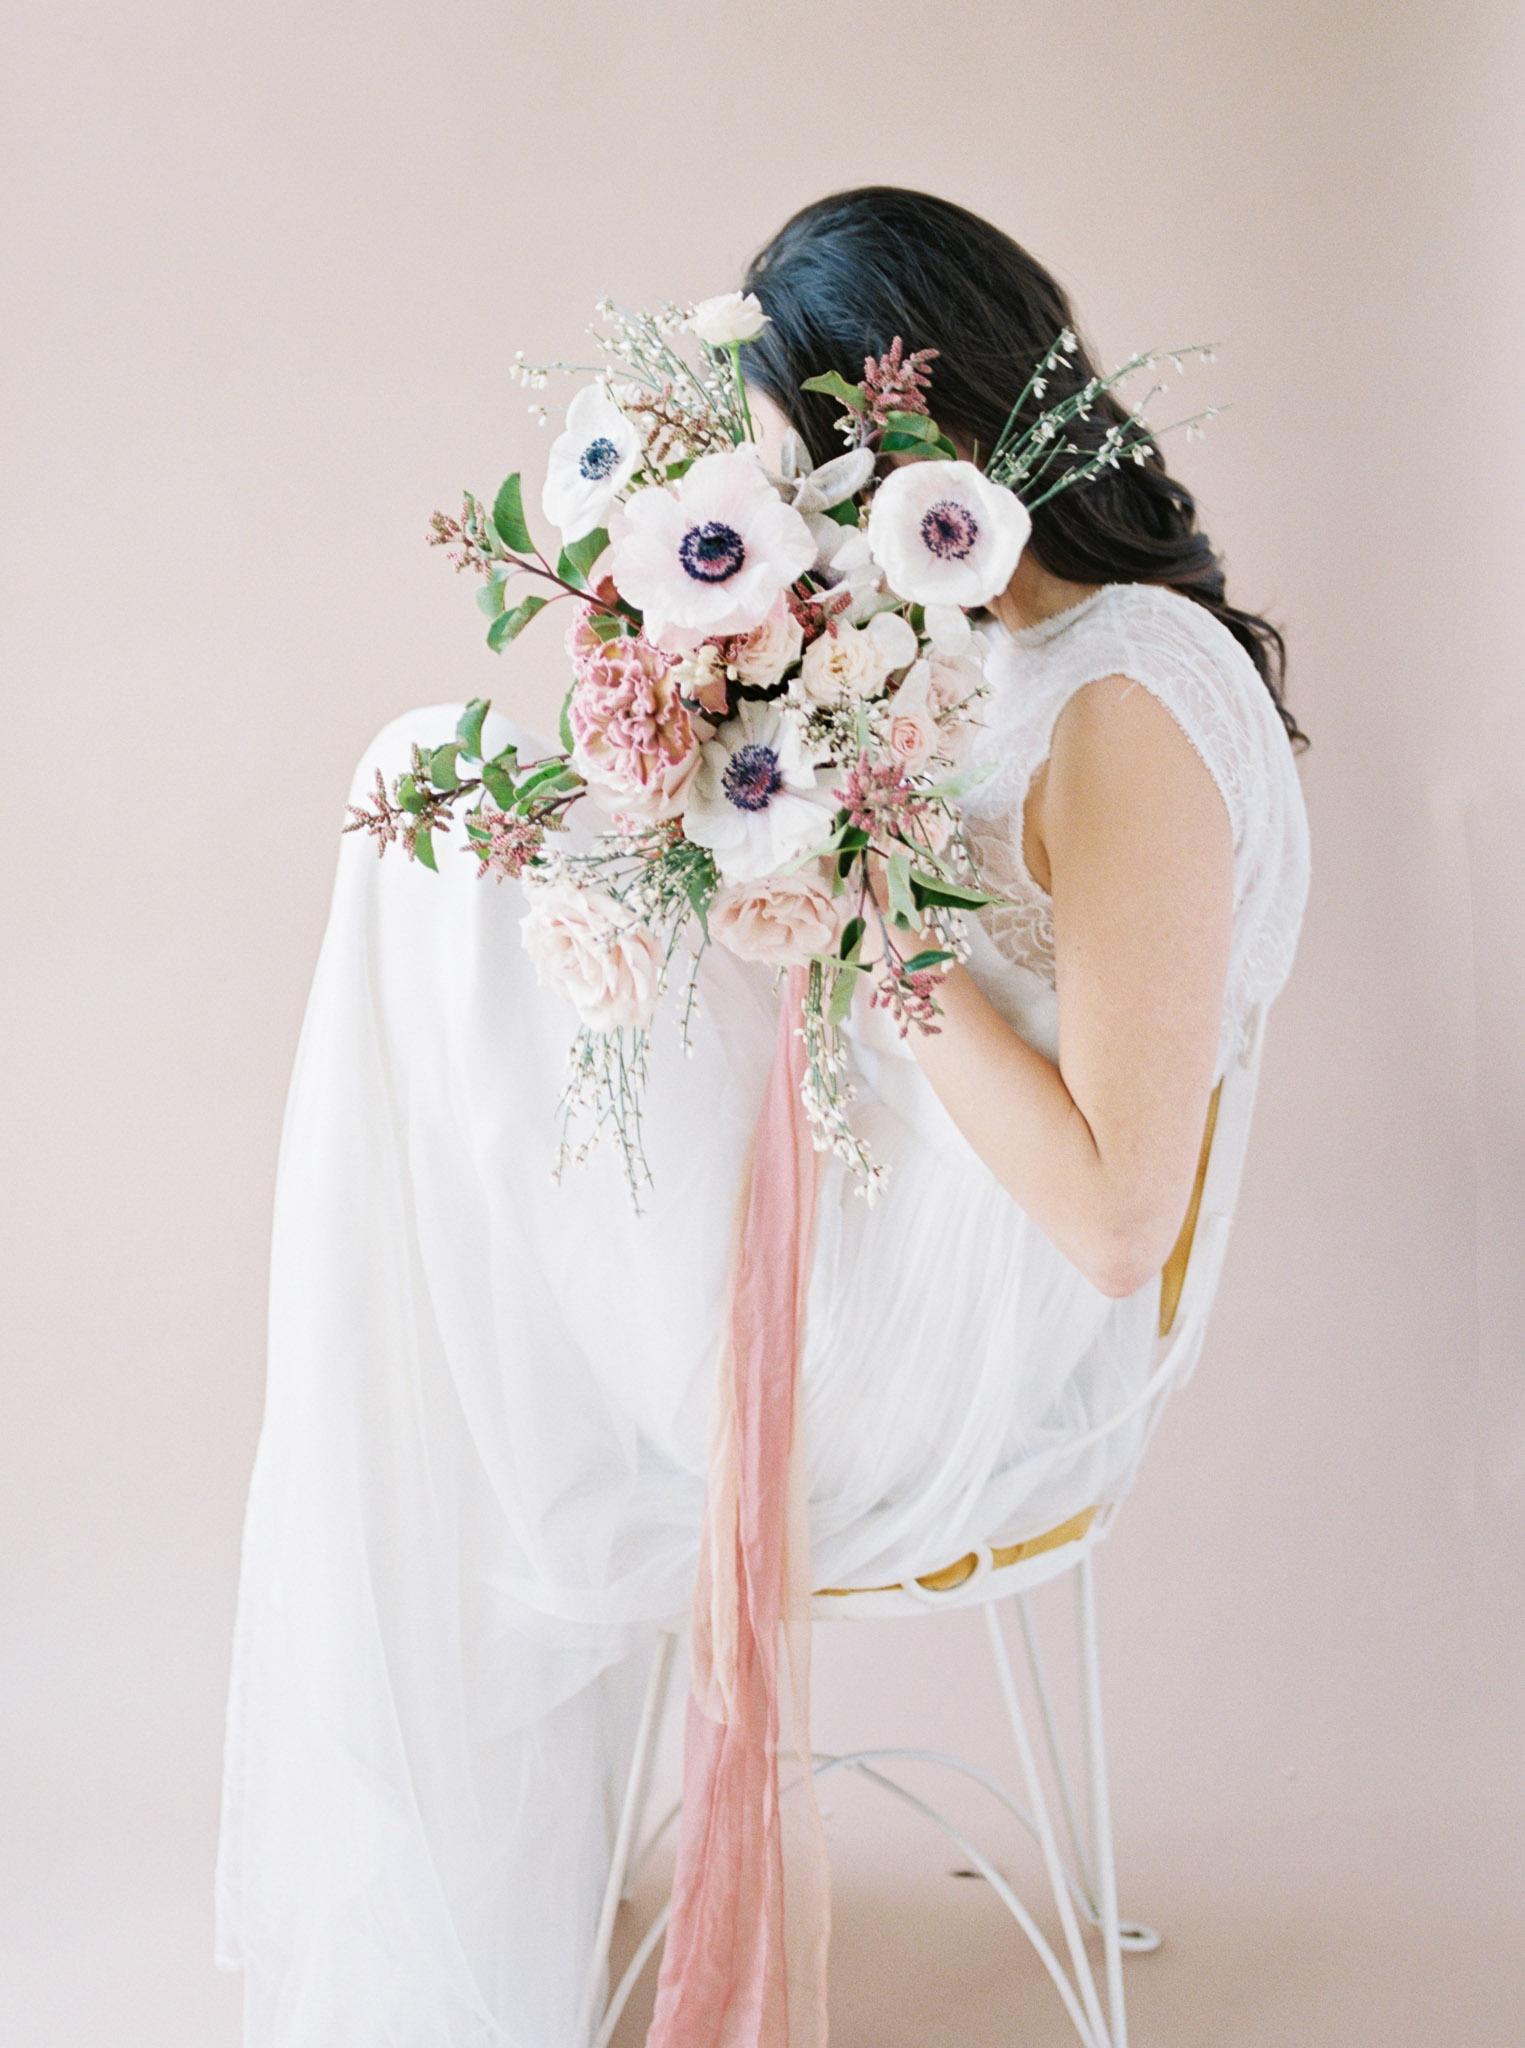 ModernNaturalStyledShoot_MaricleKang_Vancouver Wedding Photographer__12.jpg